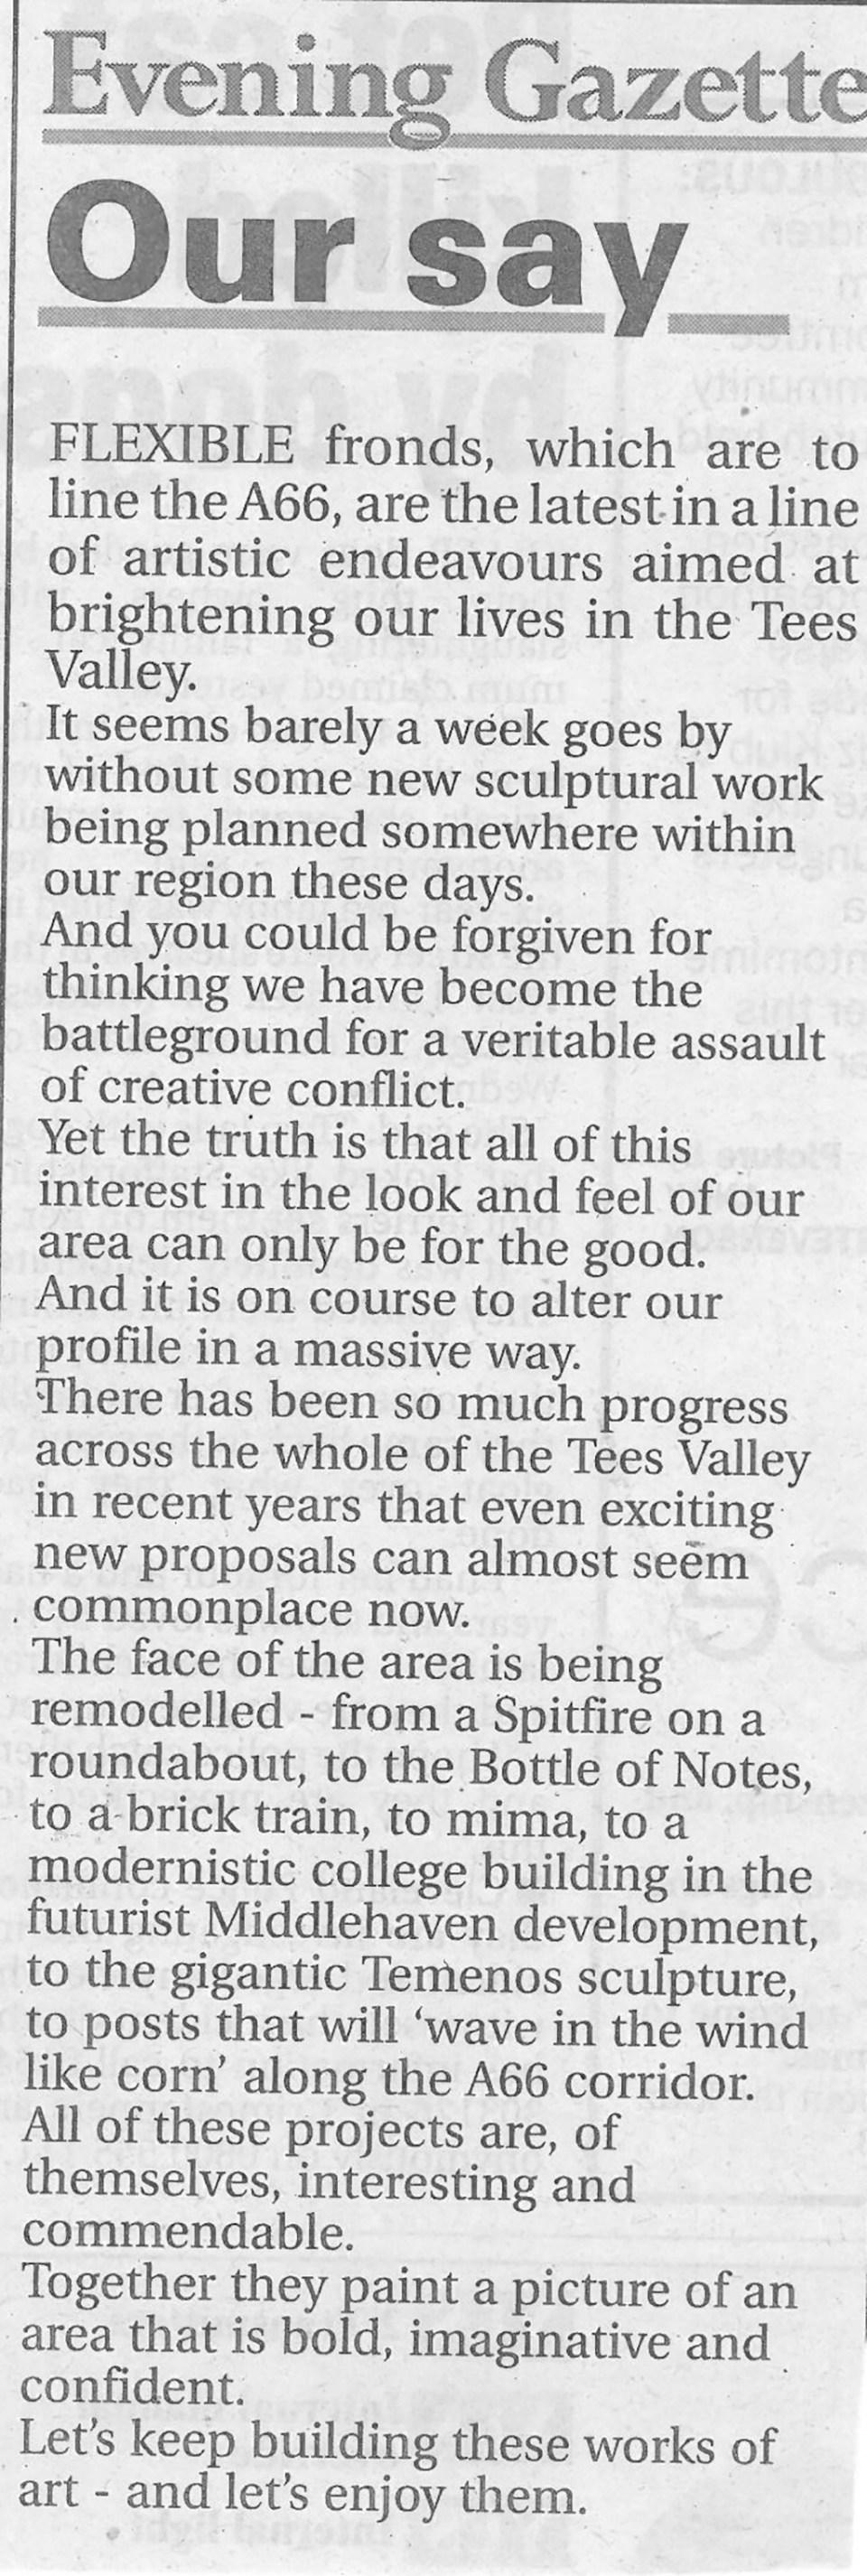 2008-07-26, Evening Gazette